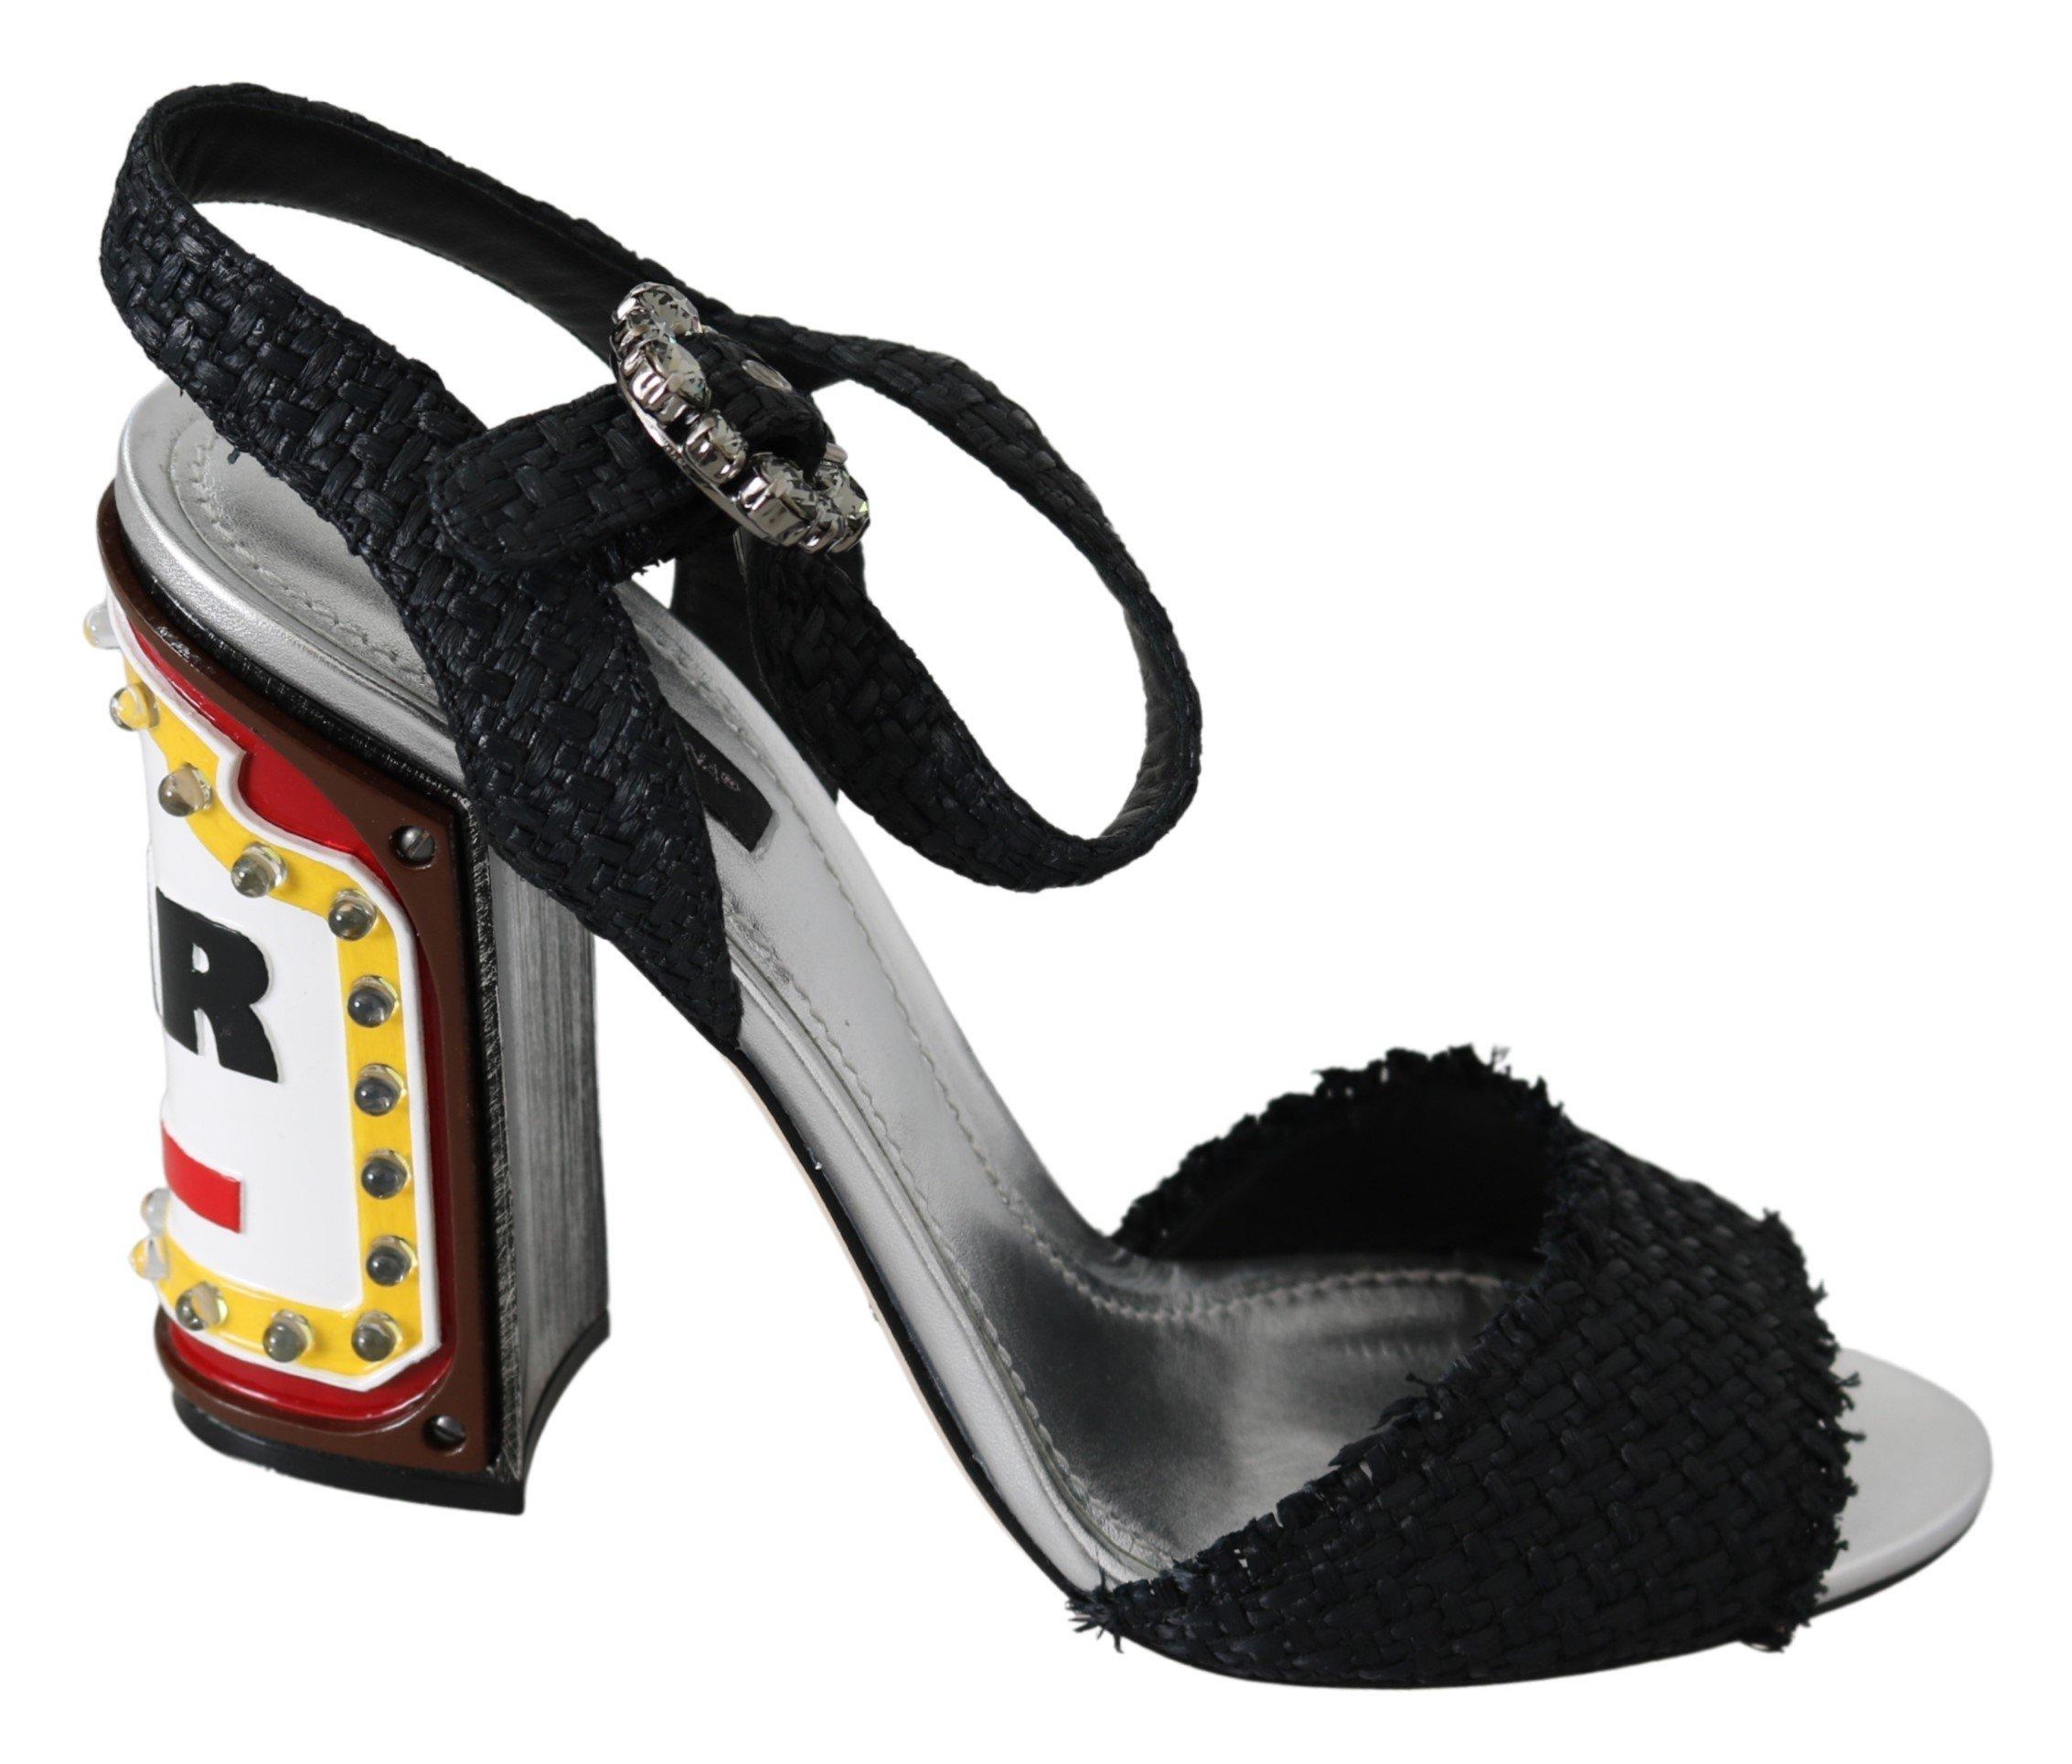 Dolce & Gabbana Women's Crystals LED LIGHTS Sandals Black LA7645-40 - EU37/US6.5